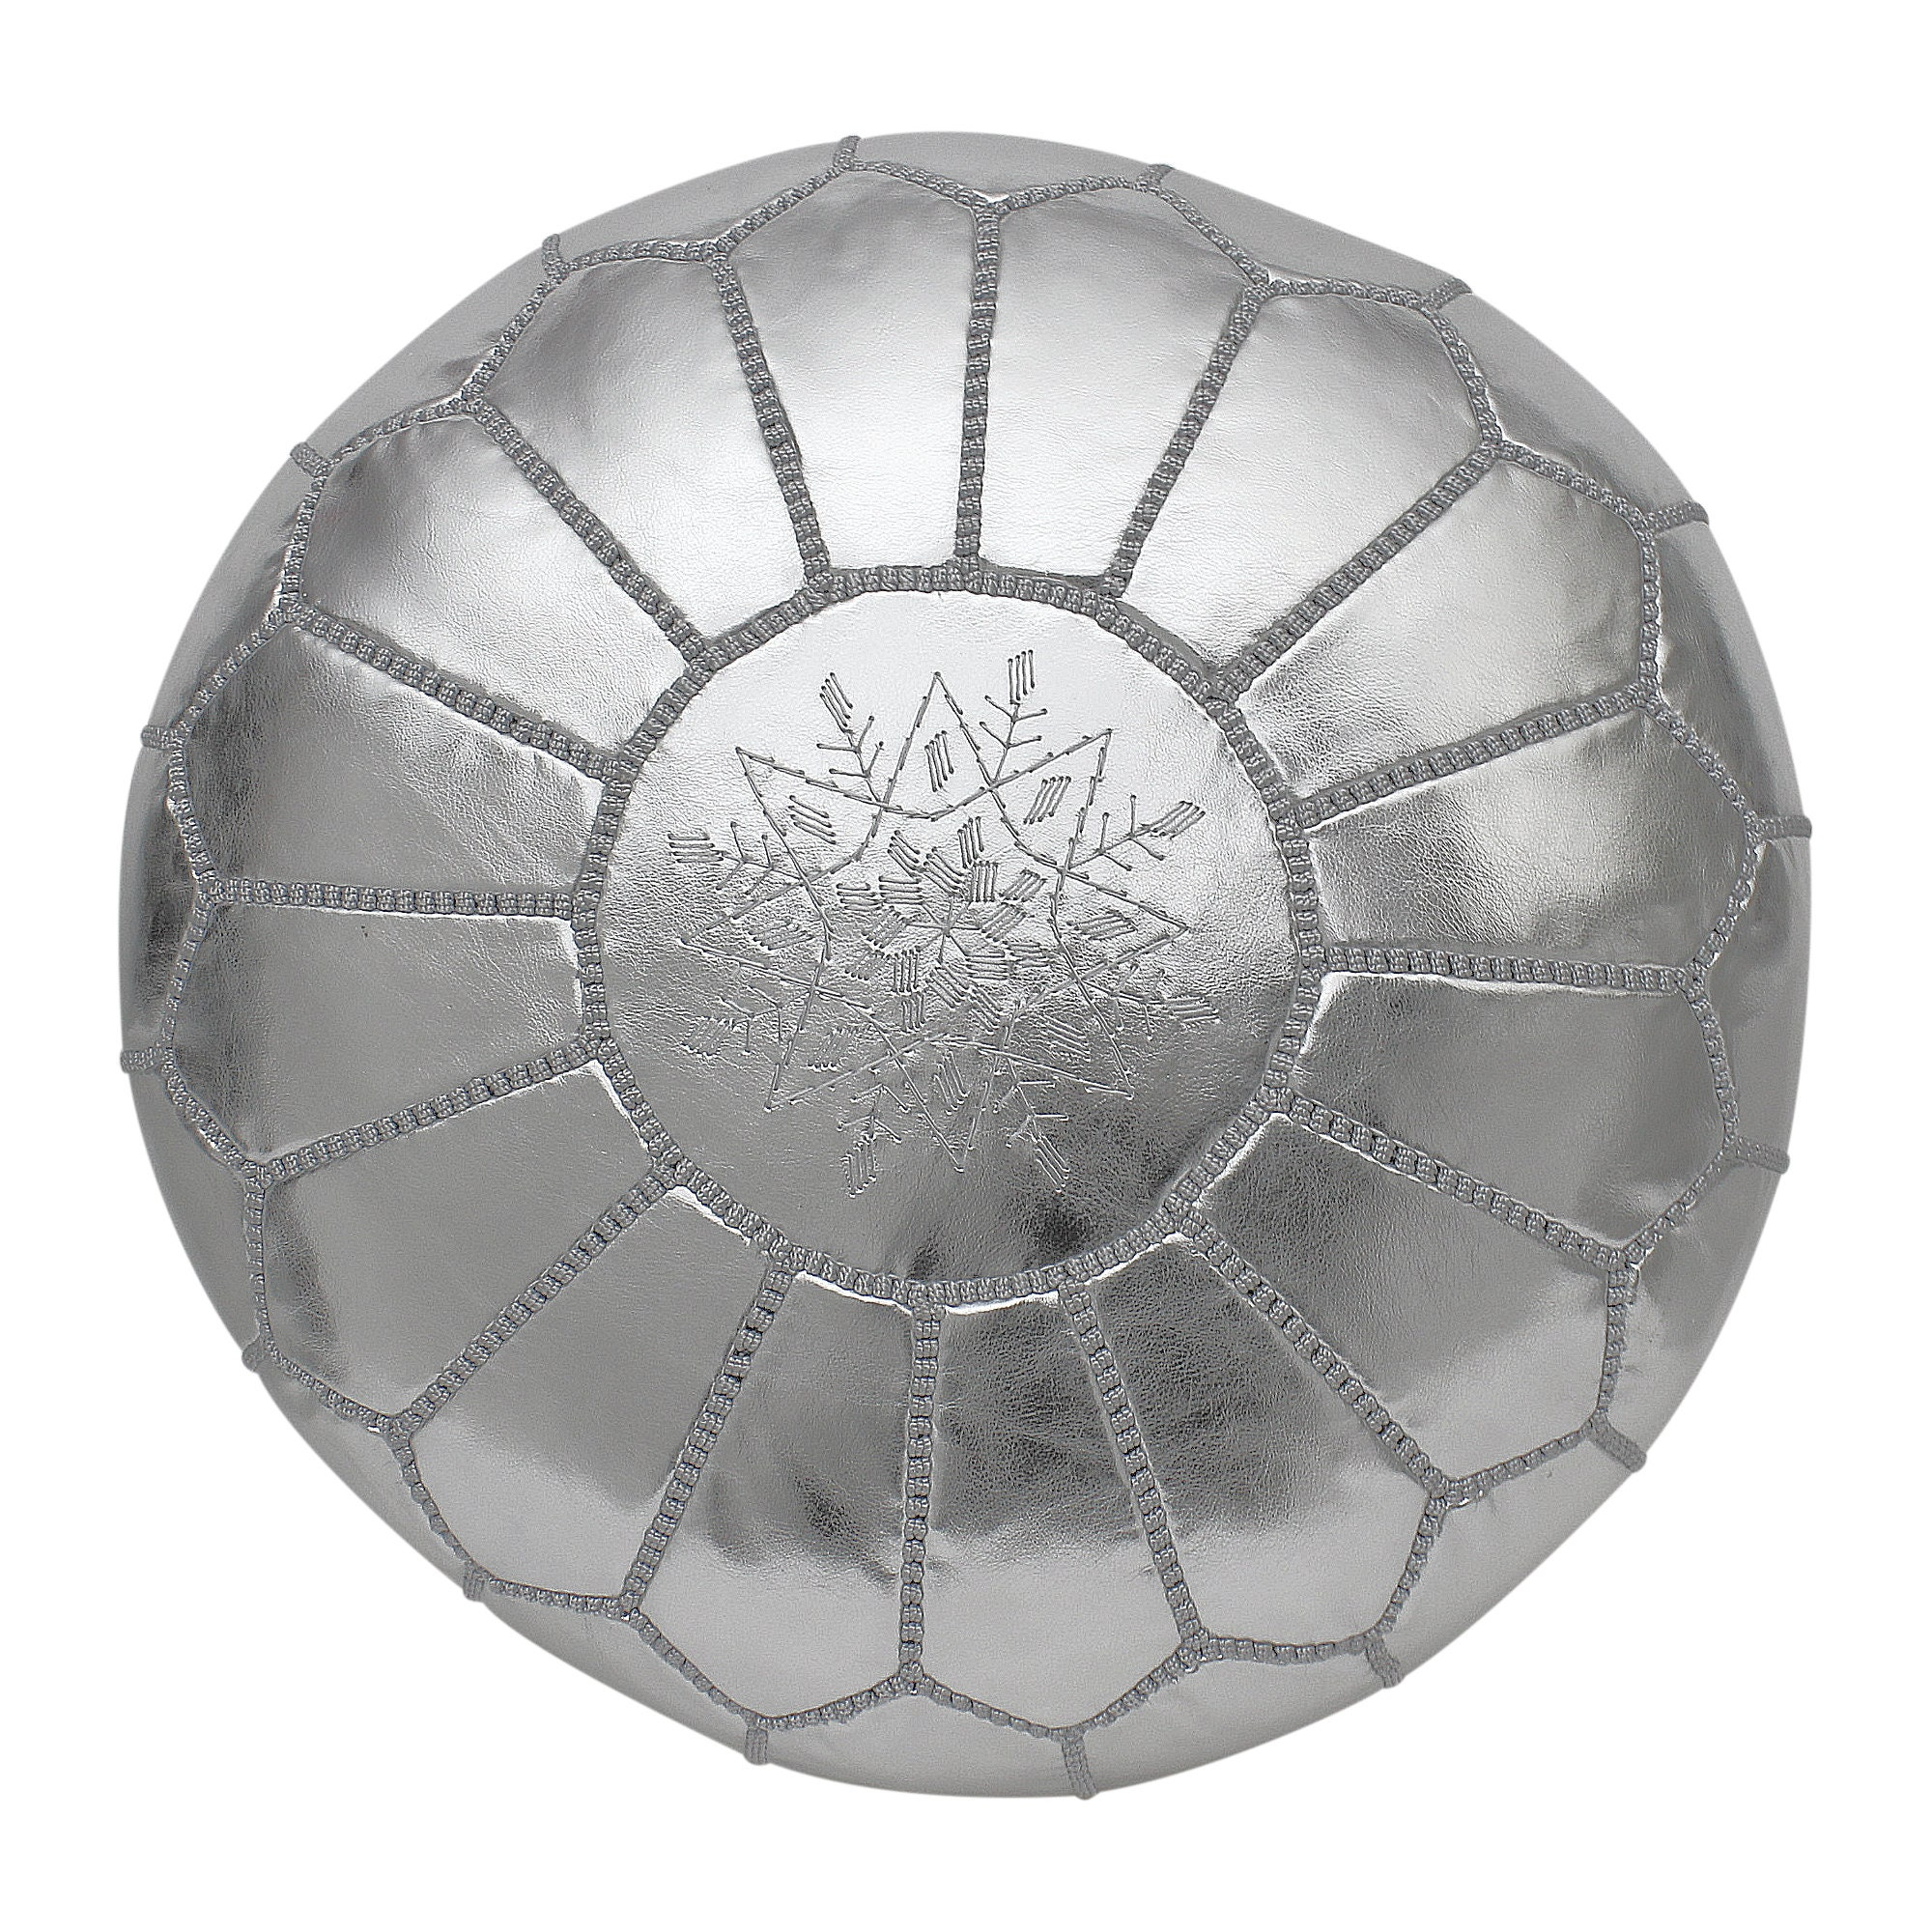 Marokkanische Pouffe Pouf Ottoman Hocker in Metallic Silber grau Kunstleder Cover nur handgefertigt in Marokko